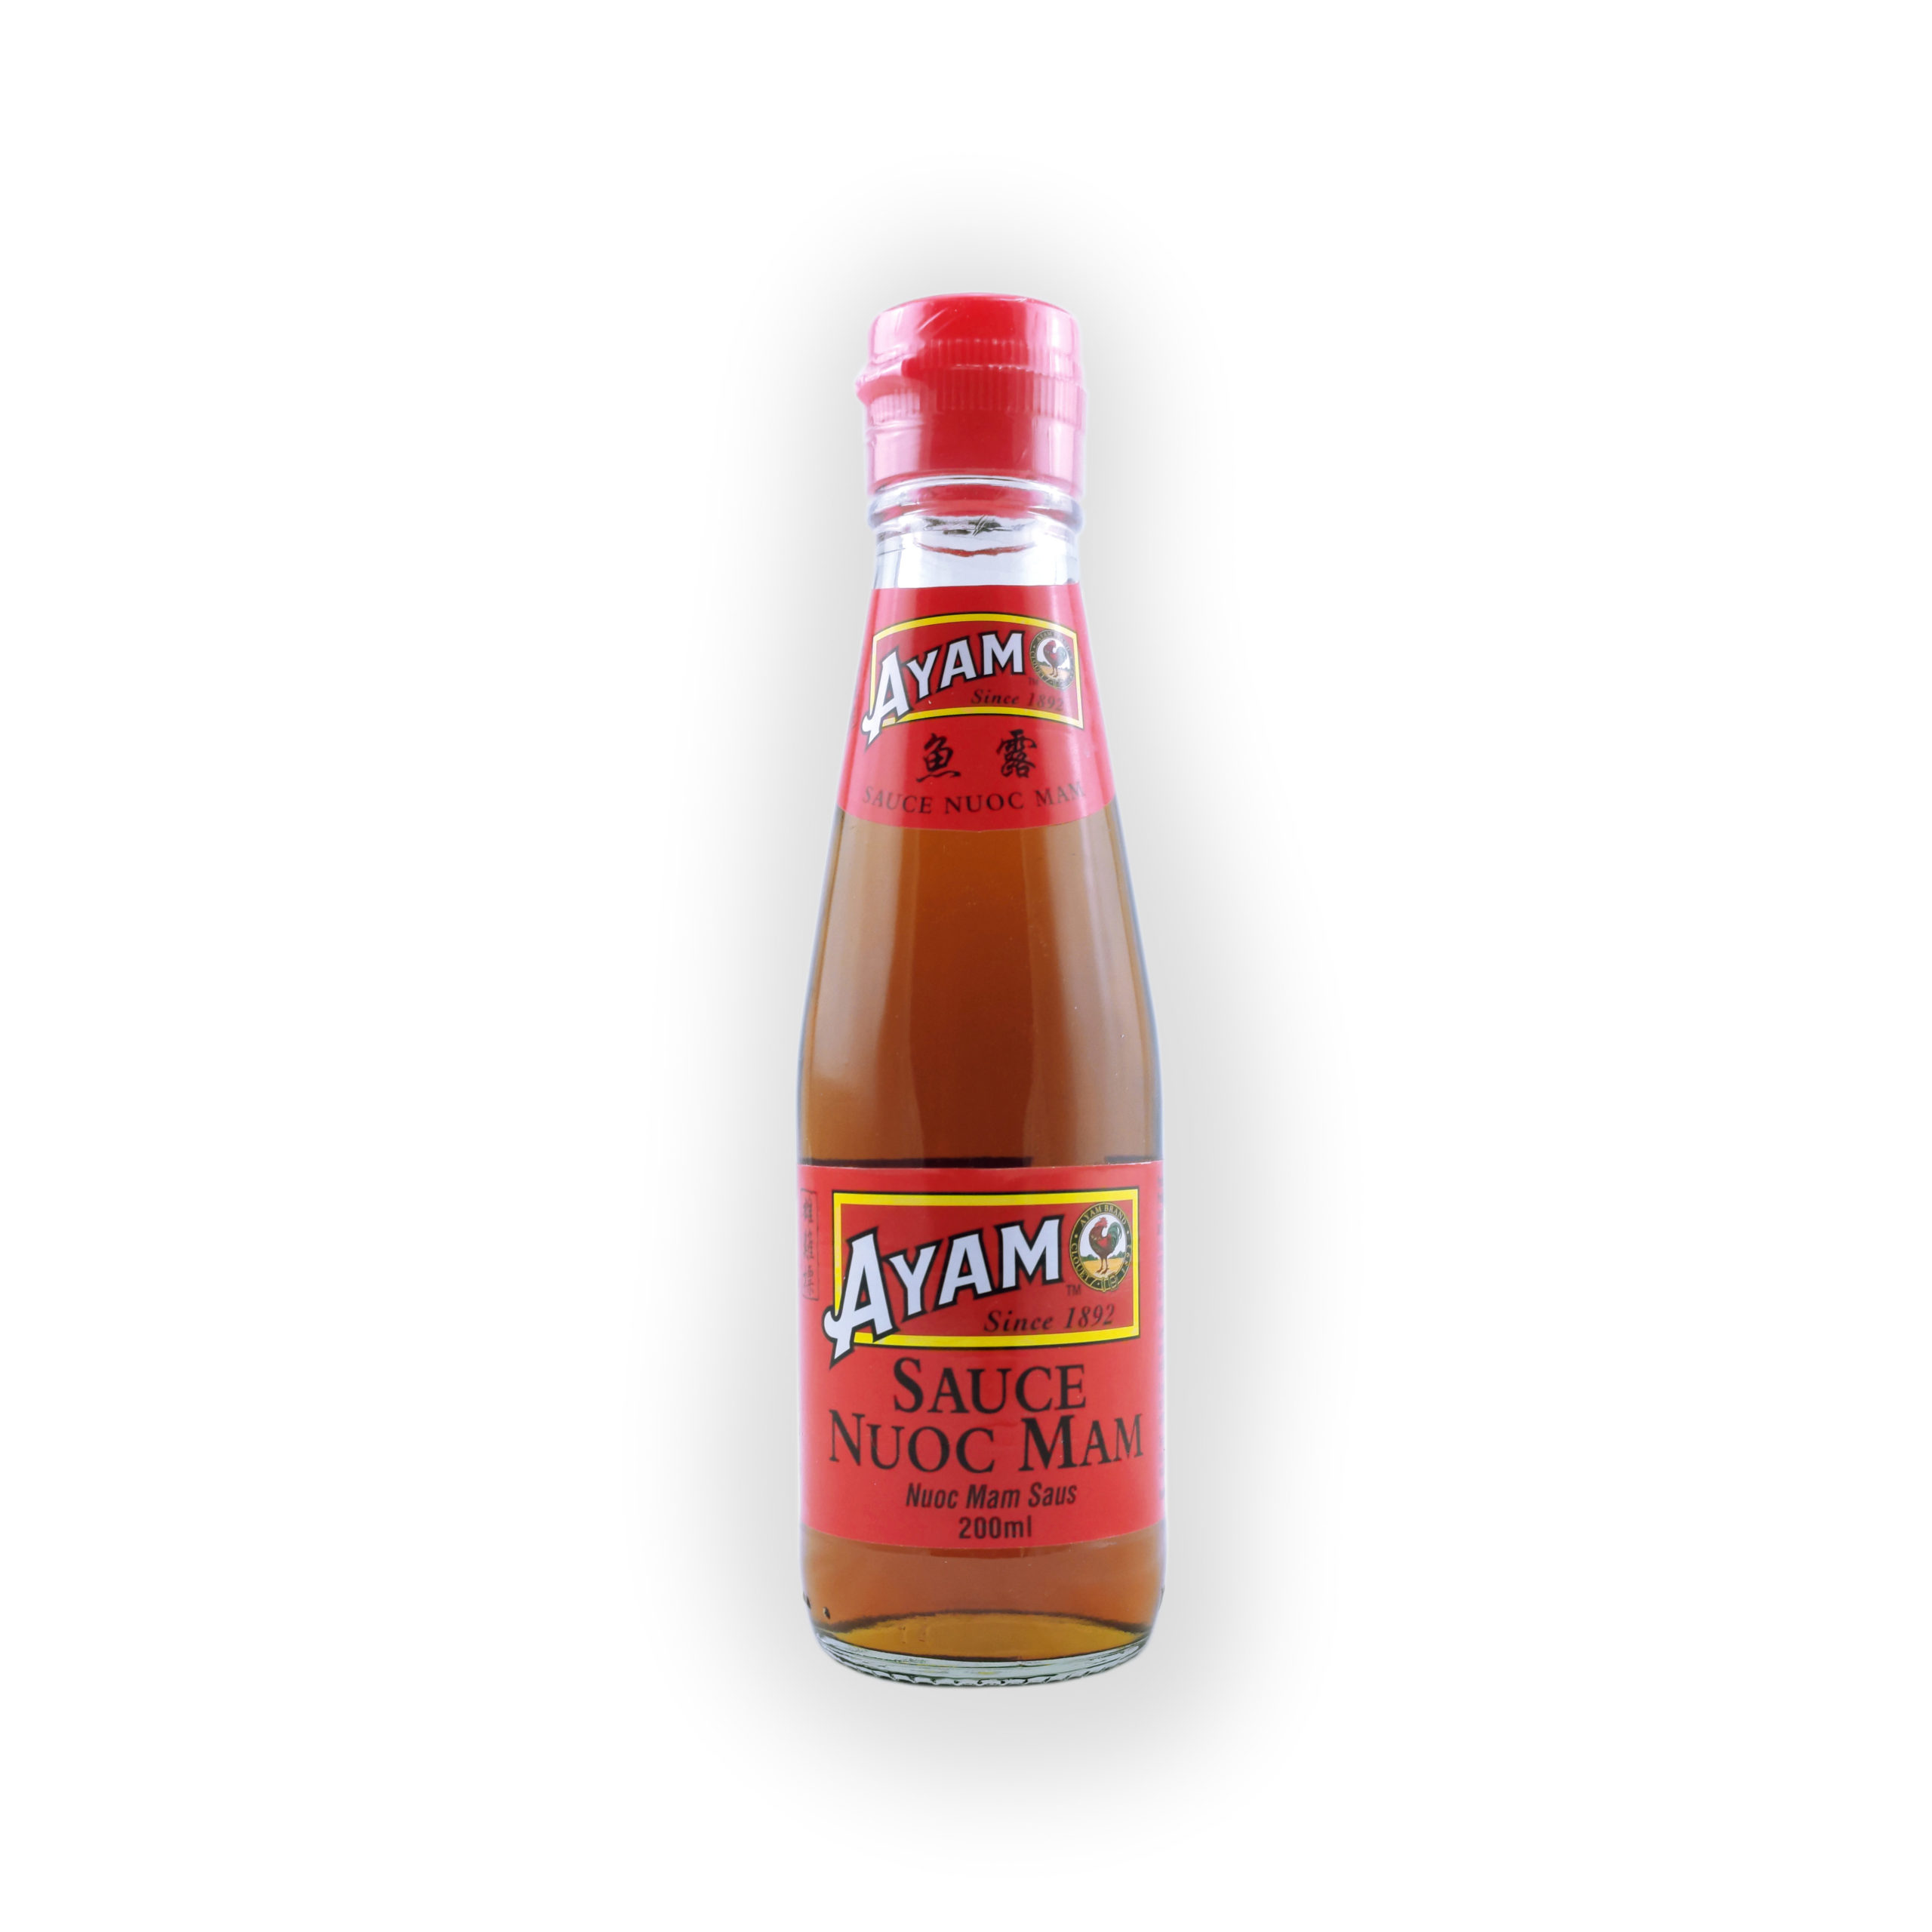 sauce-nuoc-mam-ayam-200ml-site-web-moushenco